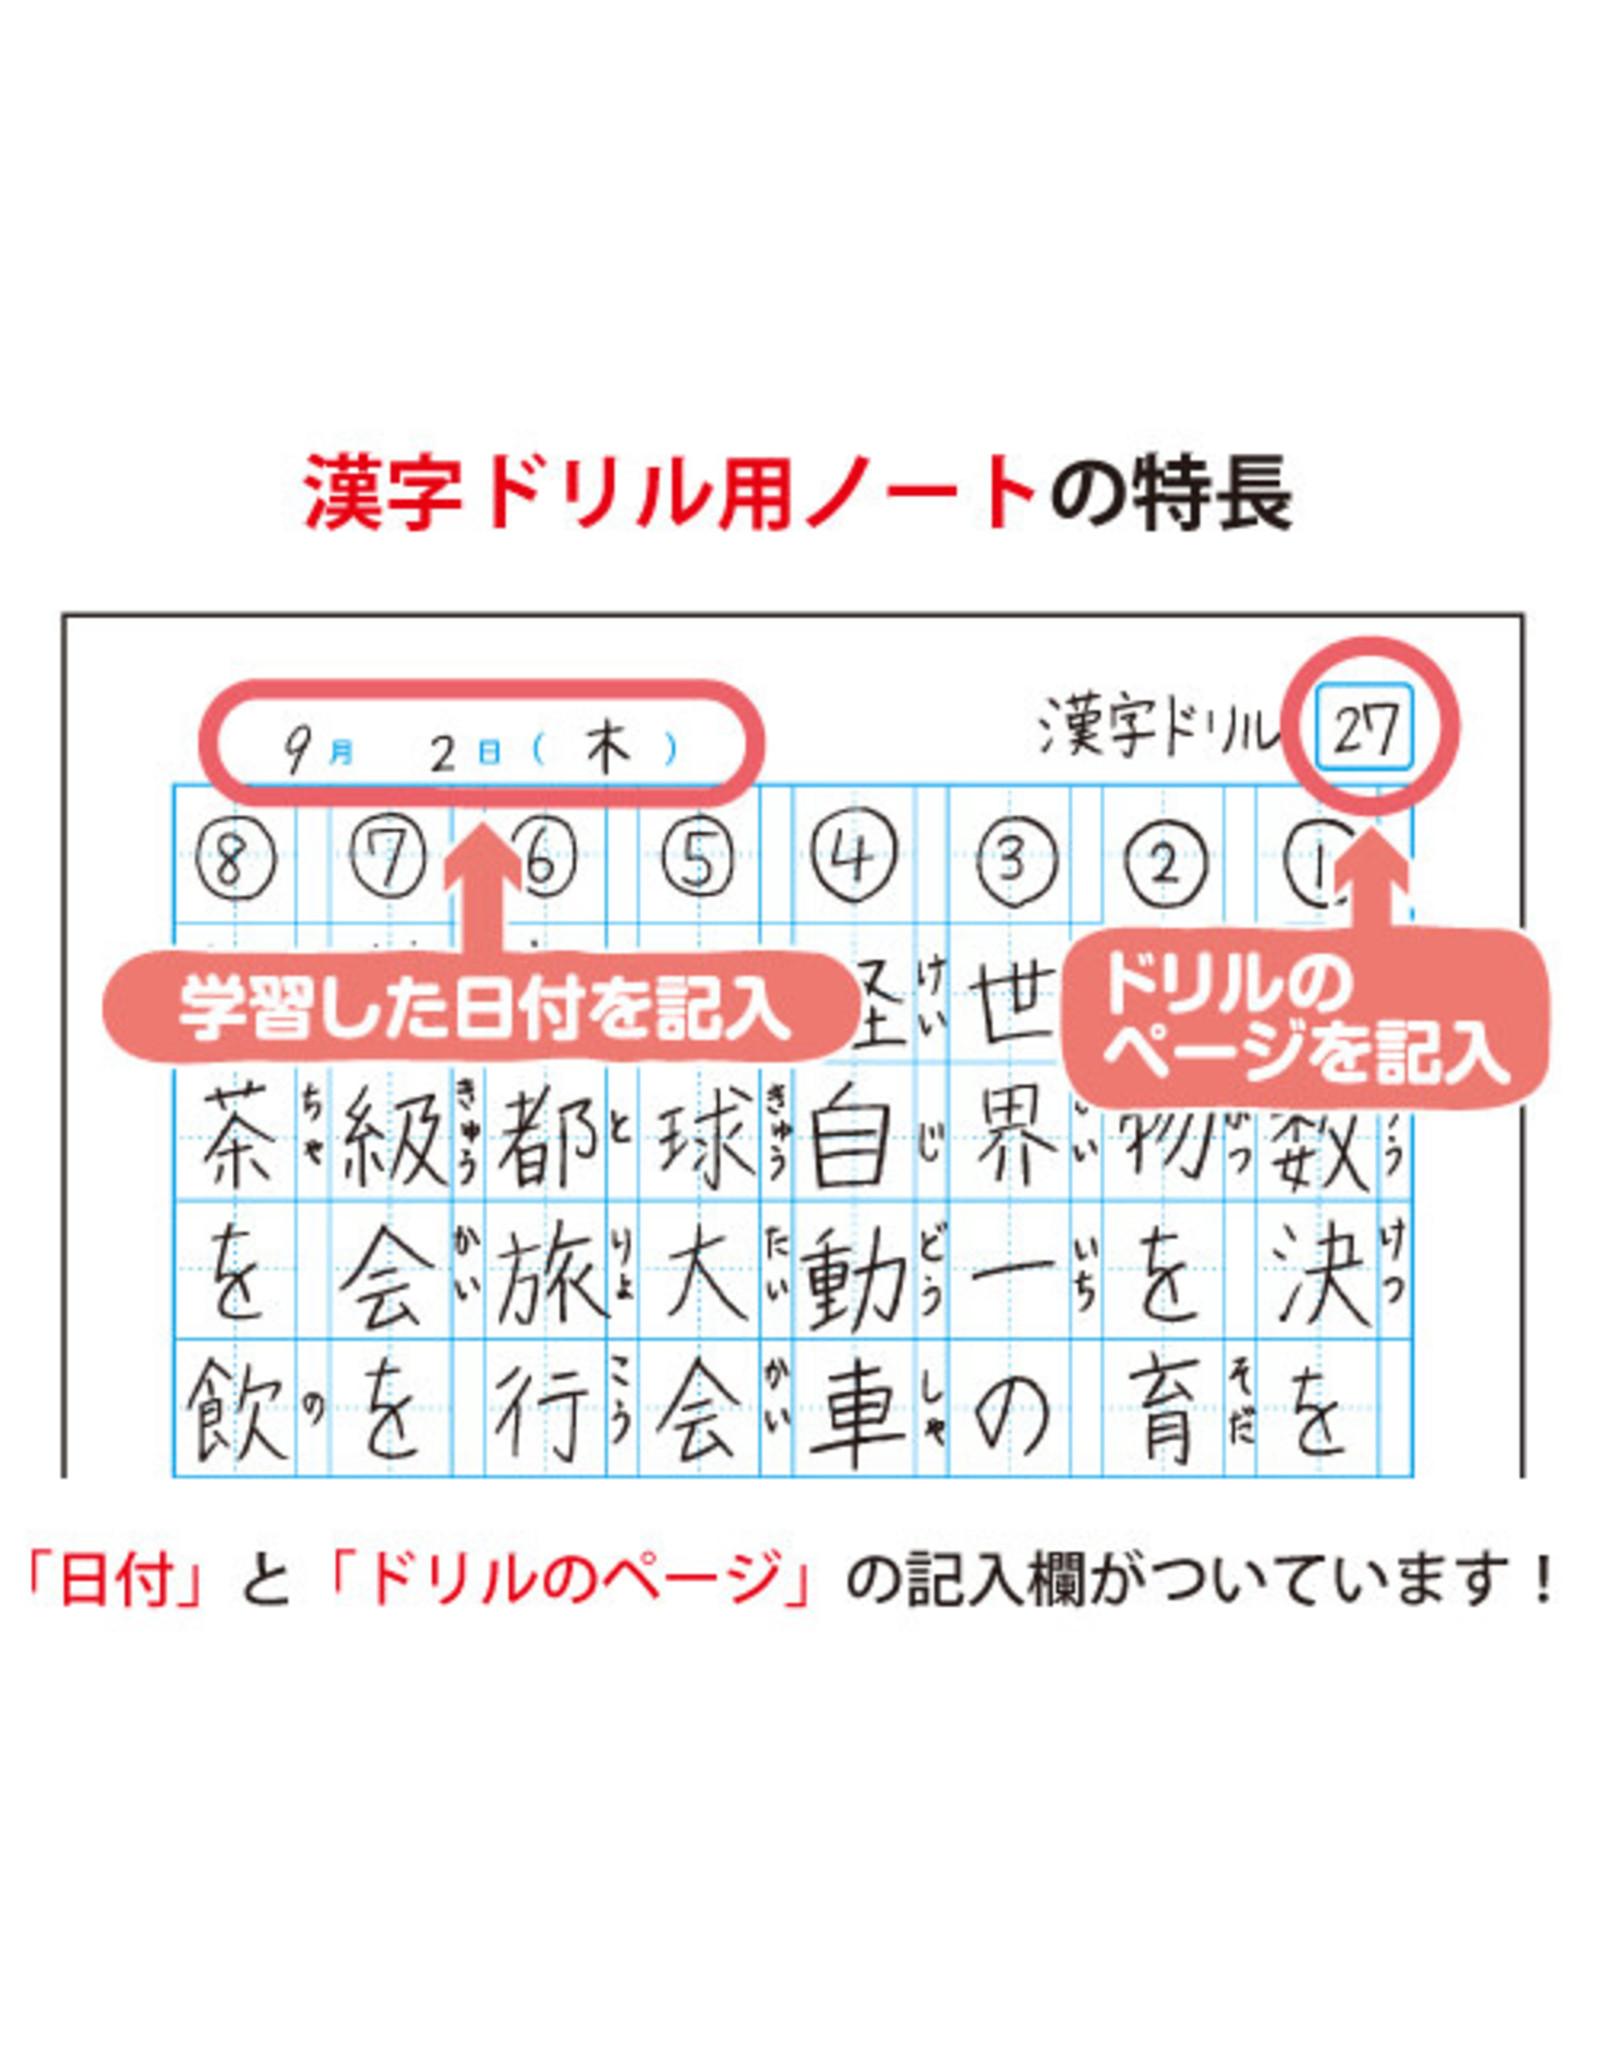 Kyokuto Associates co., ltd. COLLEGE ANIMAL DRILL NOTEBOOK KANJI 84 JI